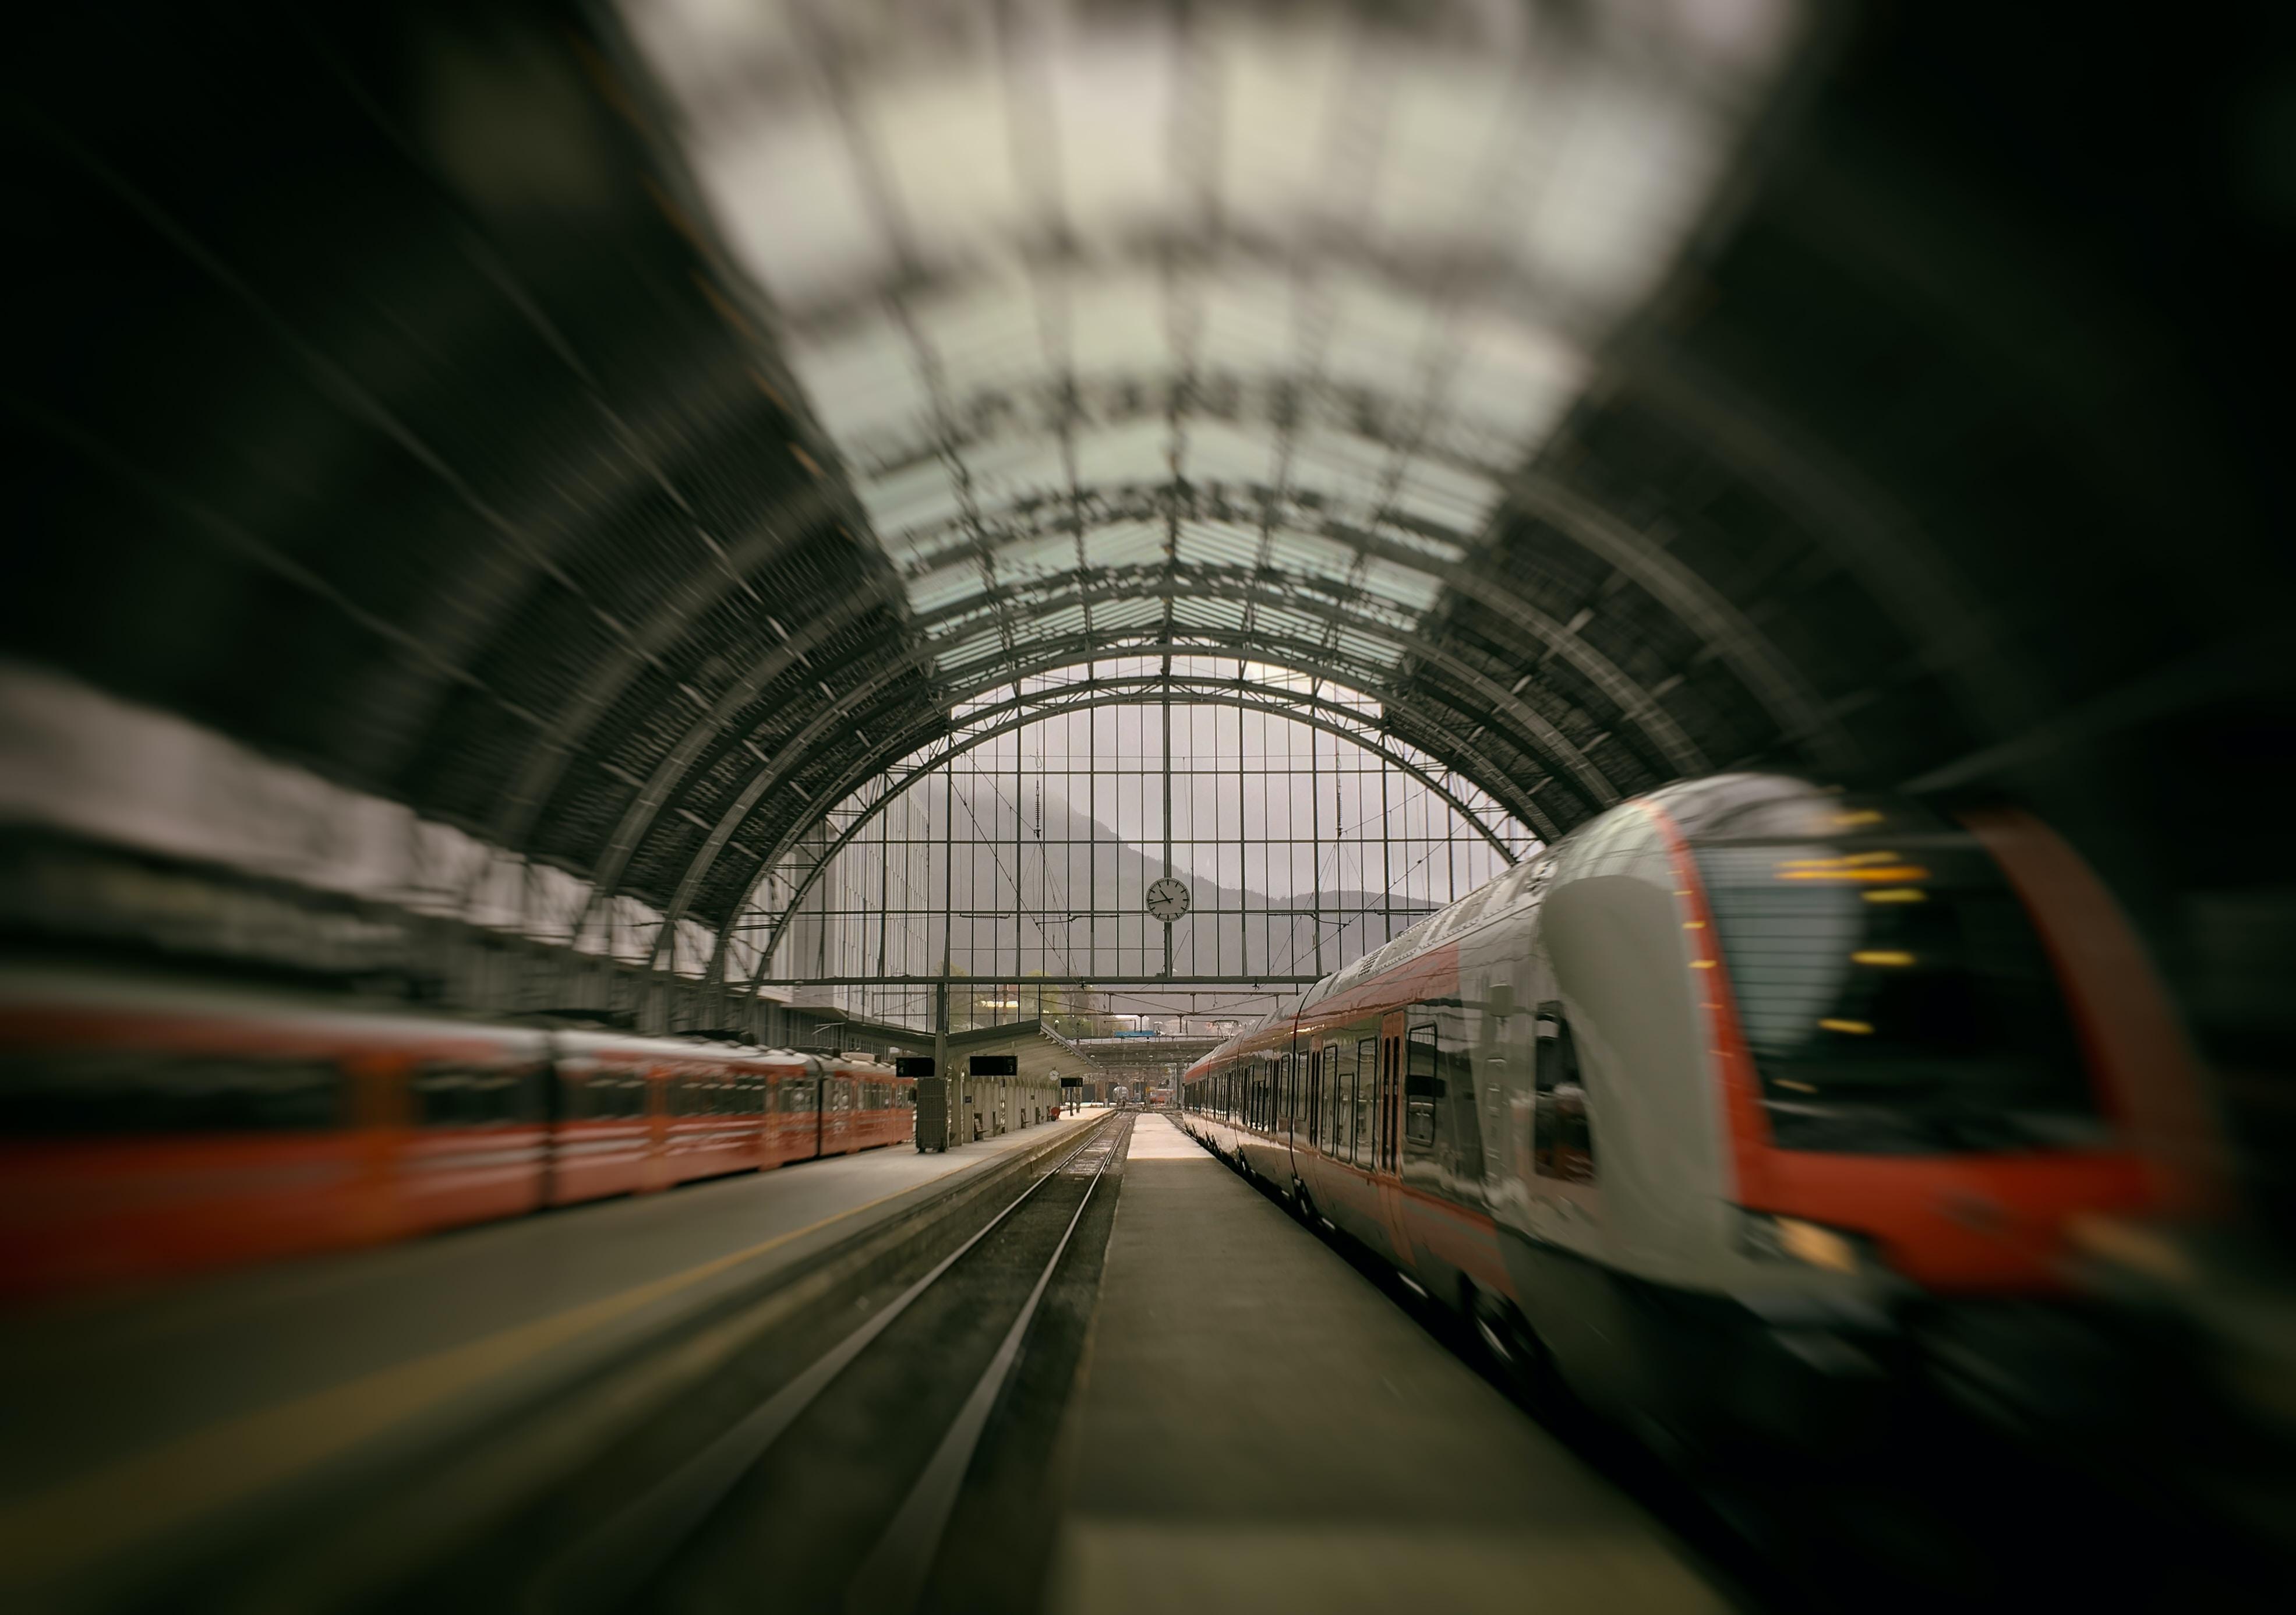 train passing on rail inside stadium